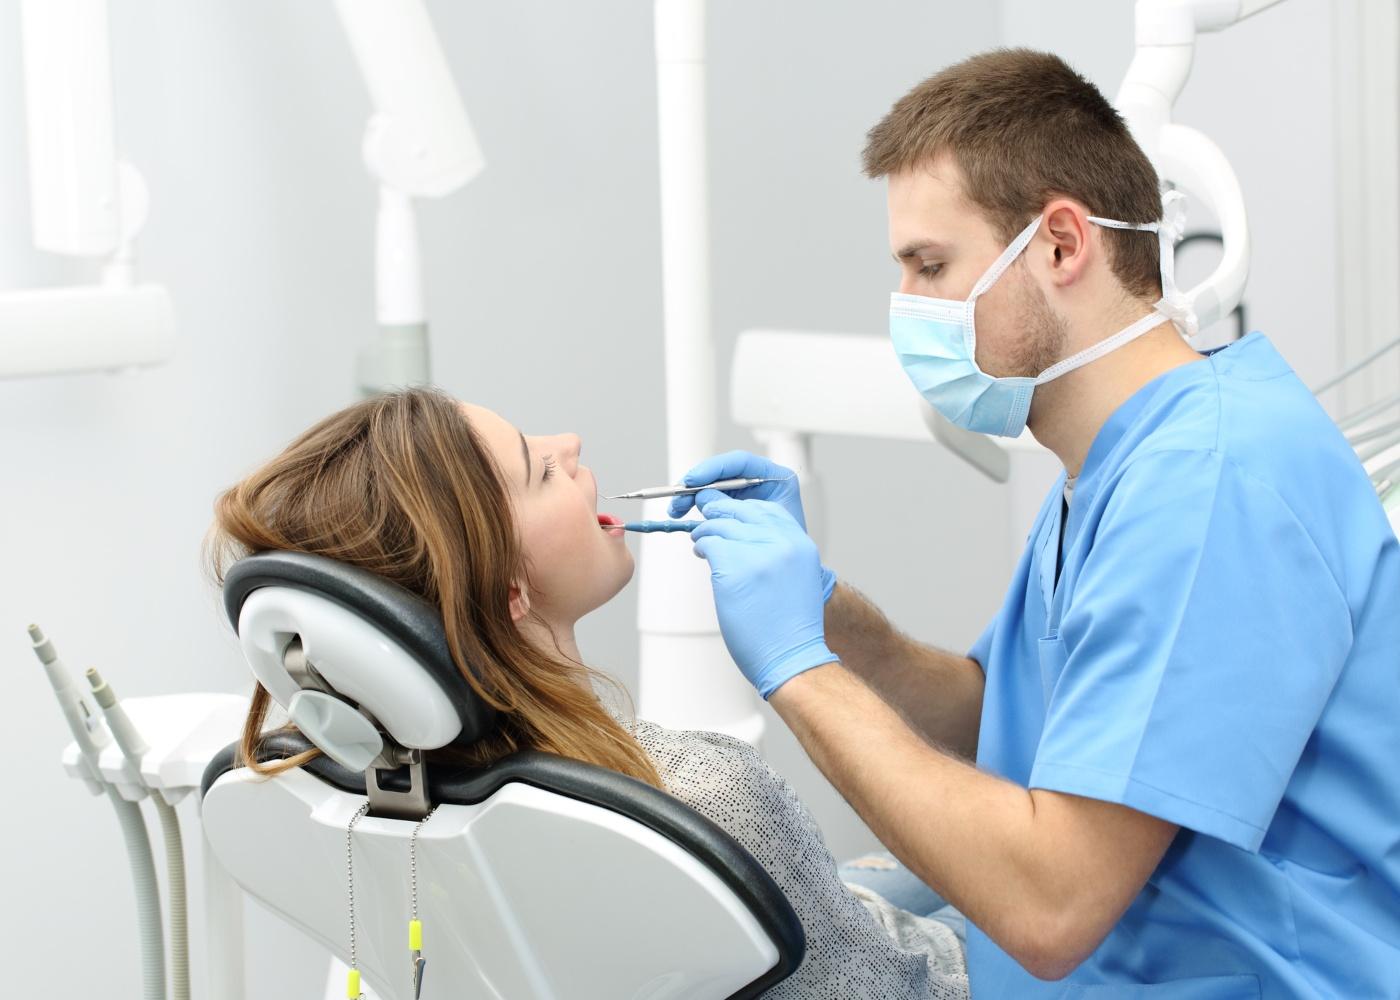 dentista a tratar paciente